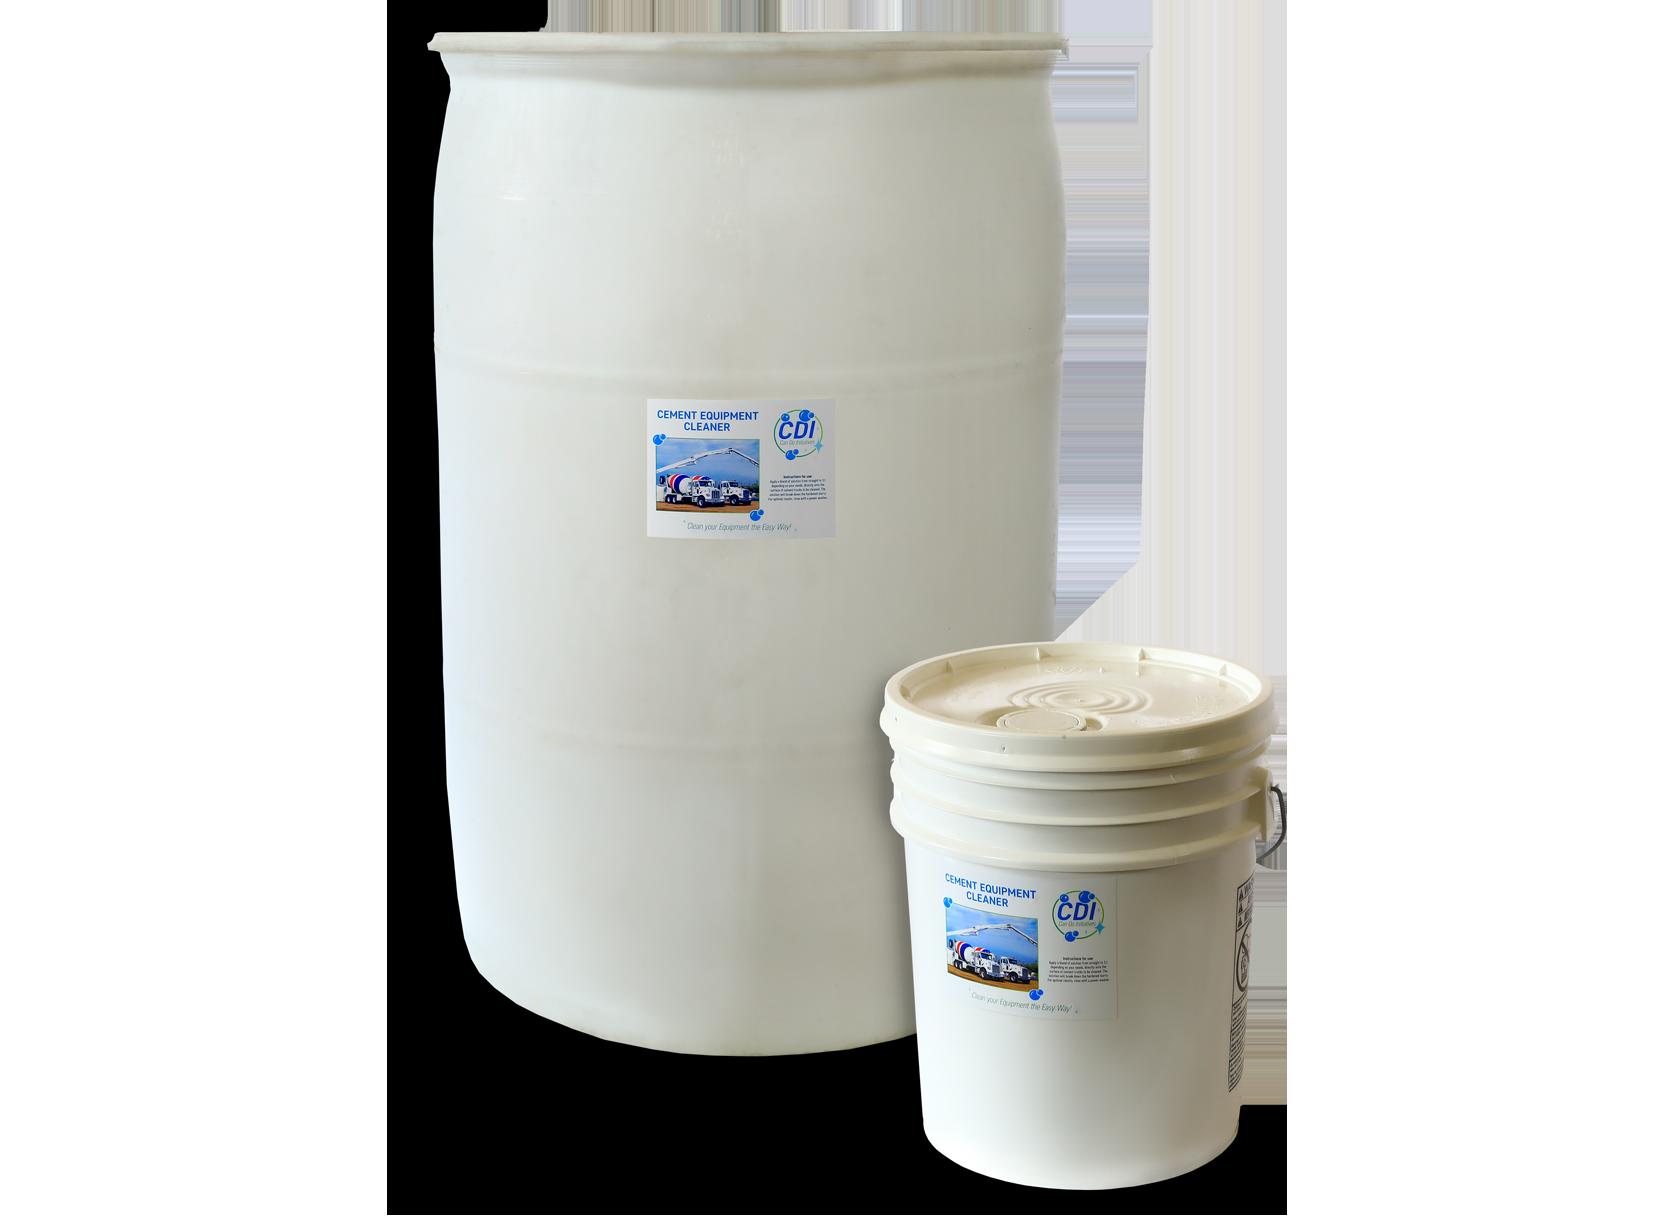 Cement Equipment Cleaner - 5 Gallon, 55 Gallon